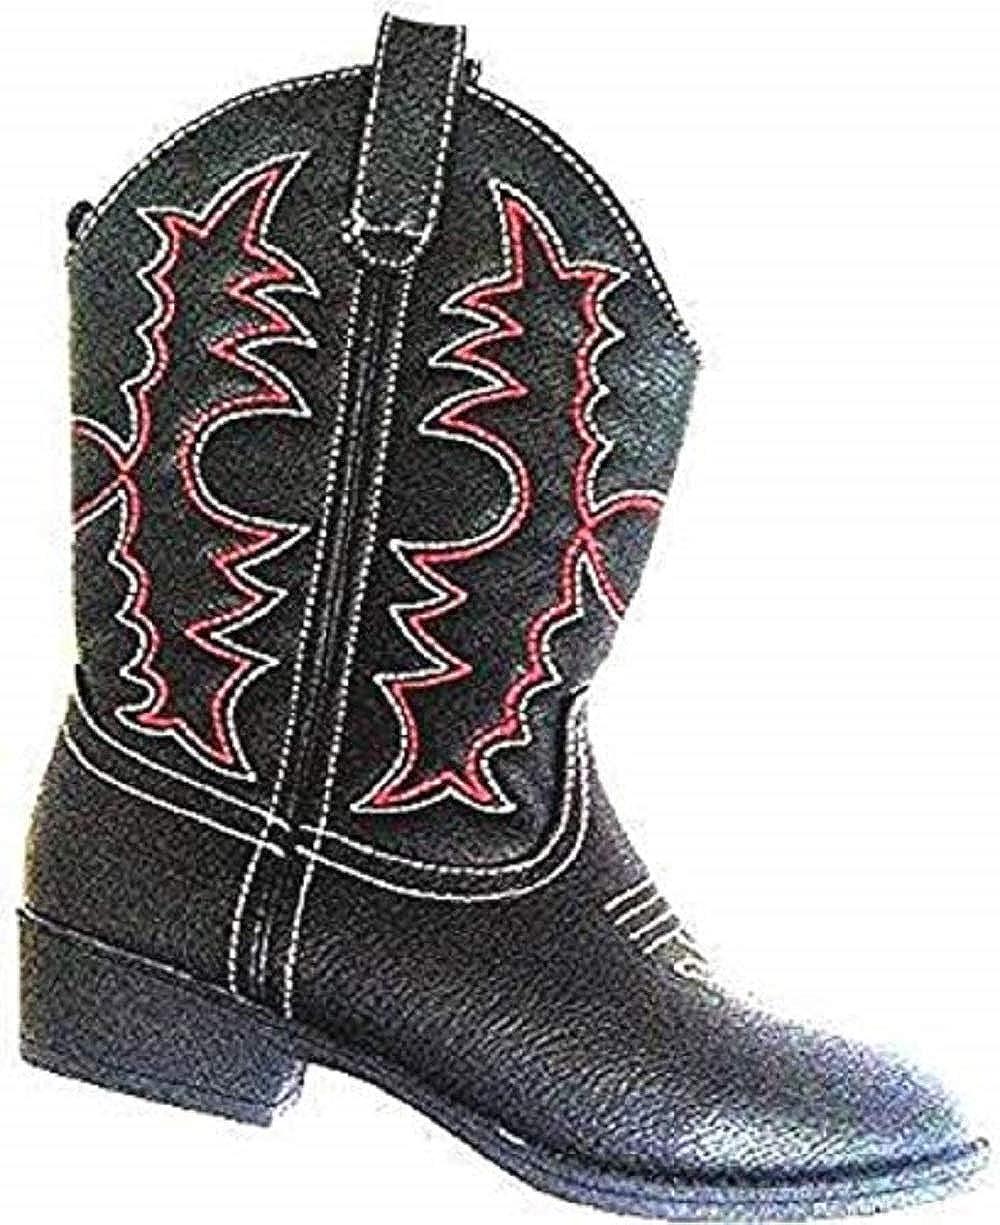 7b9ae8a4504 Amazon.com: Healthtex Cowboy Boots Toddler Boys Girls Size 9M Black ...